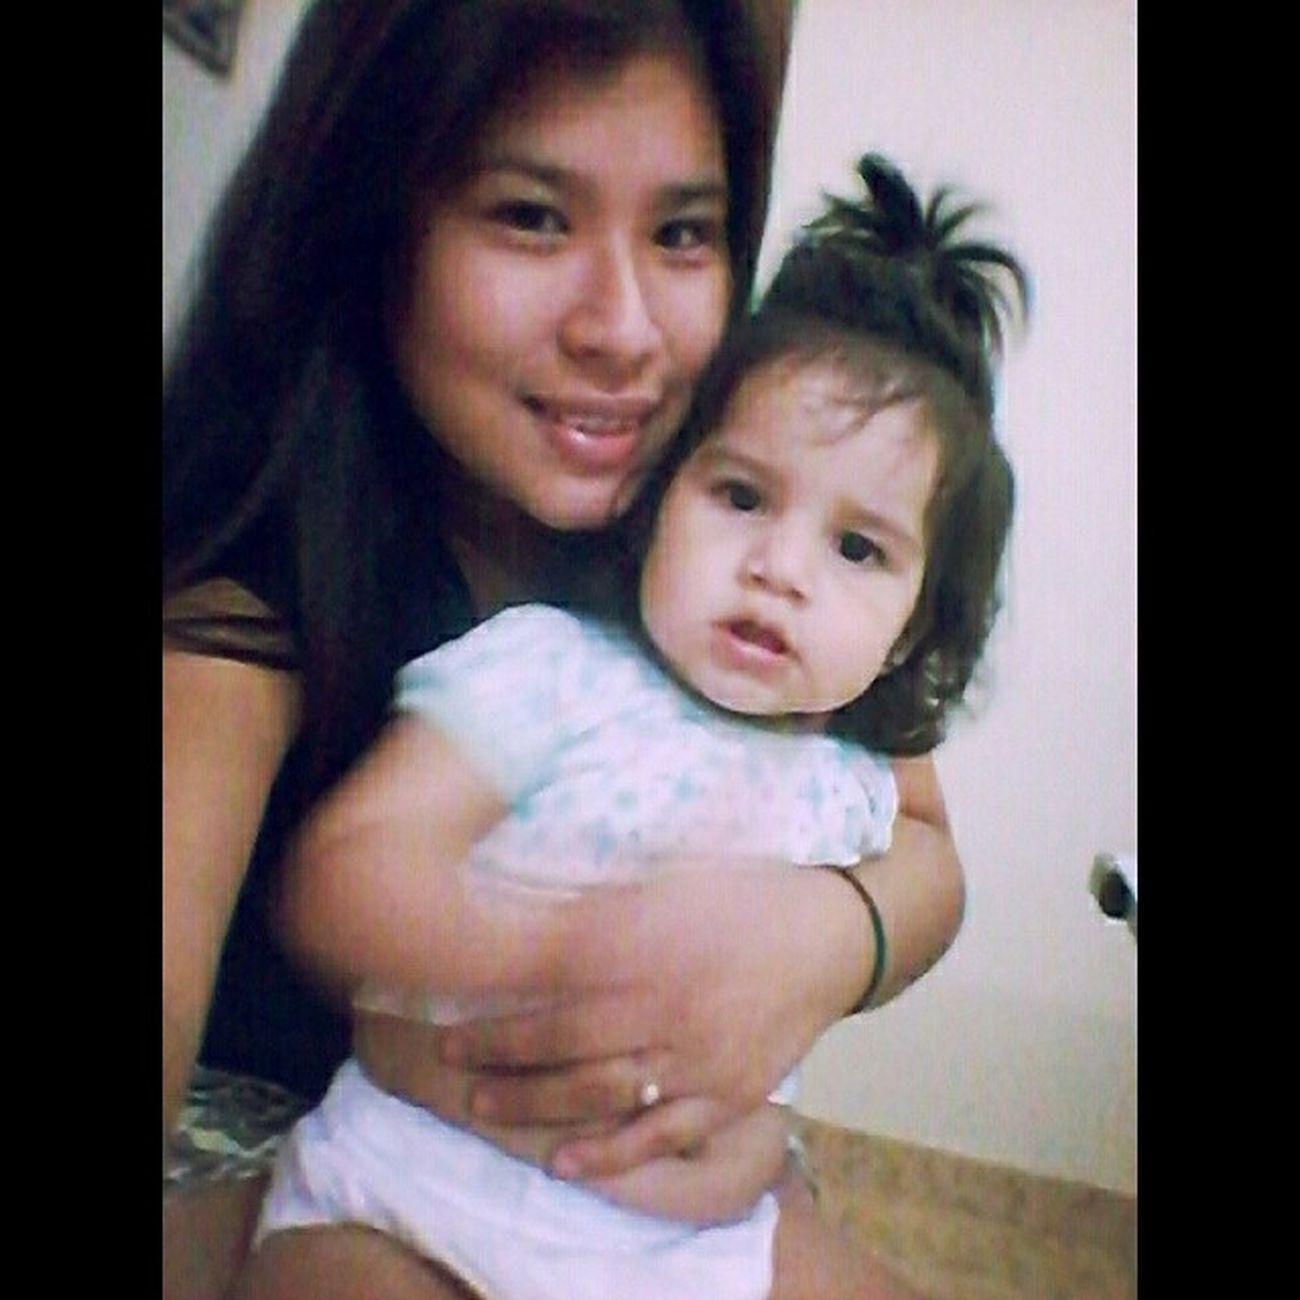 Mipulguitabella Gorditas Miprincesita♥